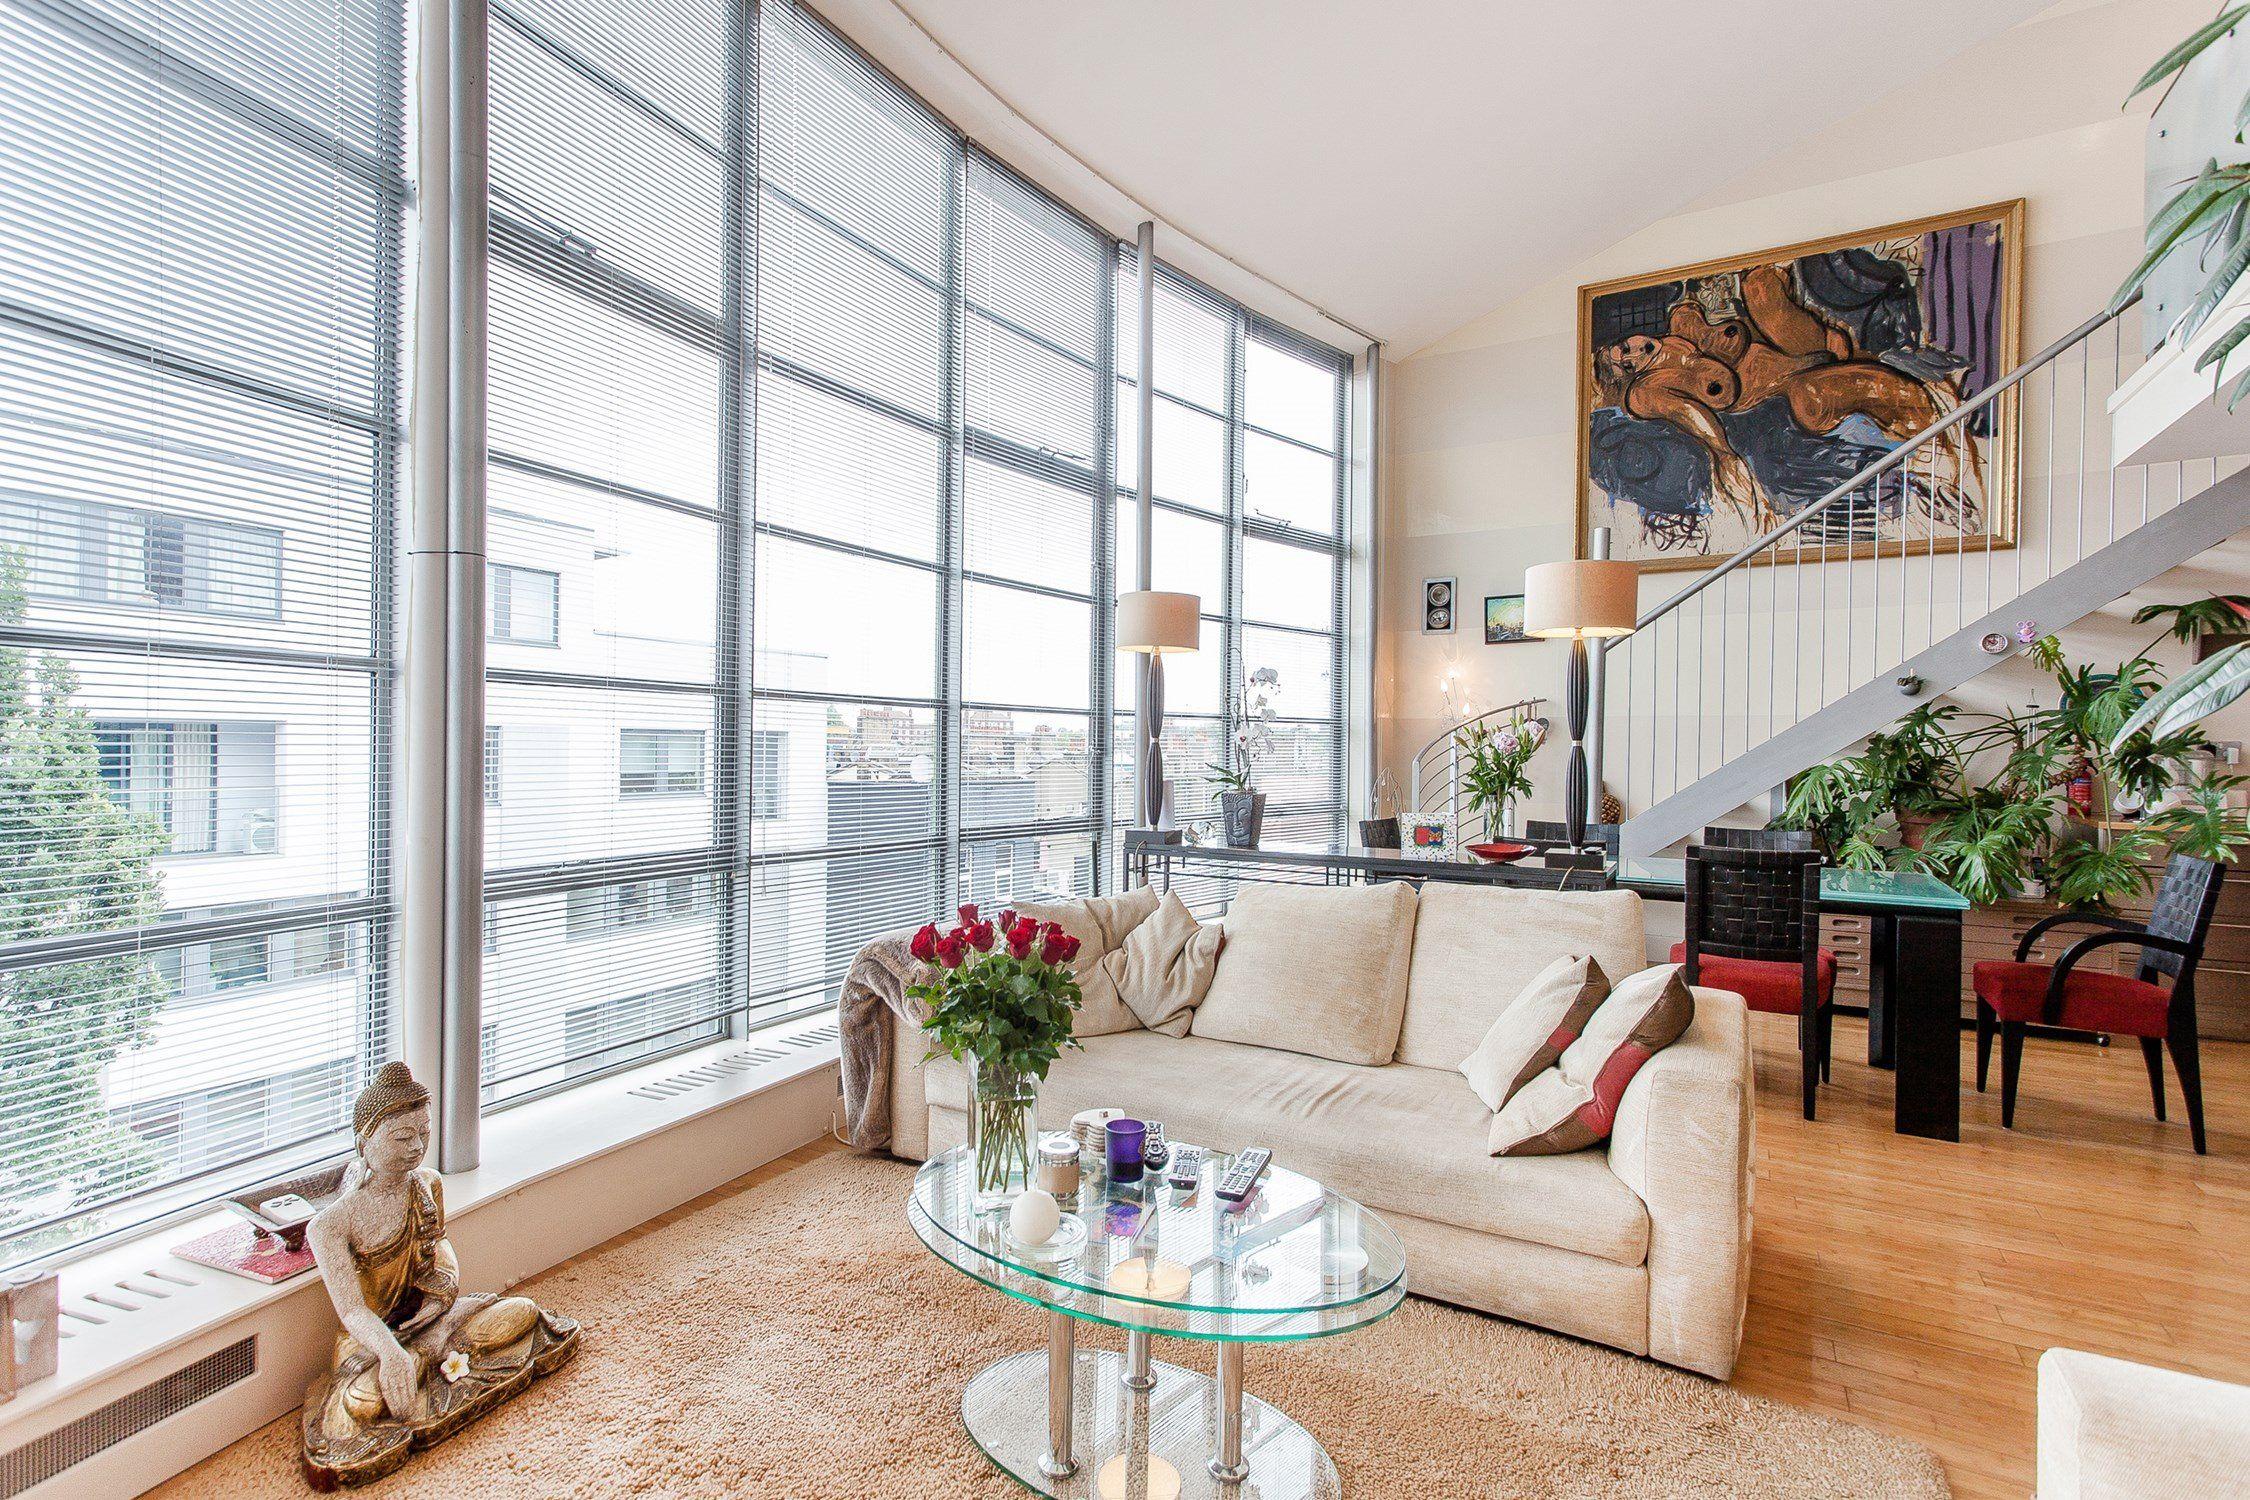 2 Bedroom Flat For Sale In Camden Arlington Road Nw1 1 700 000 Property Arlington Road Bedroom Home Decor